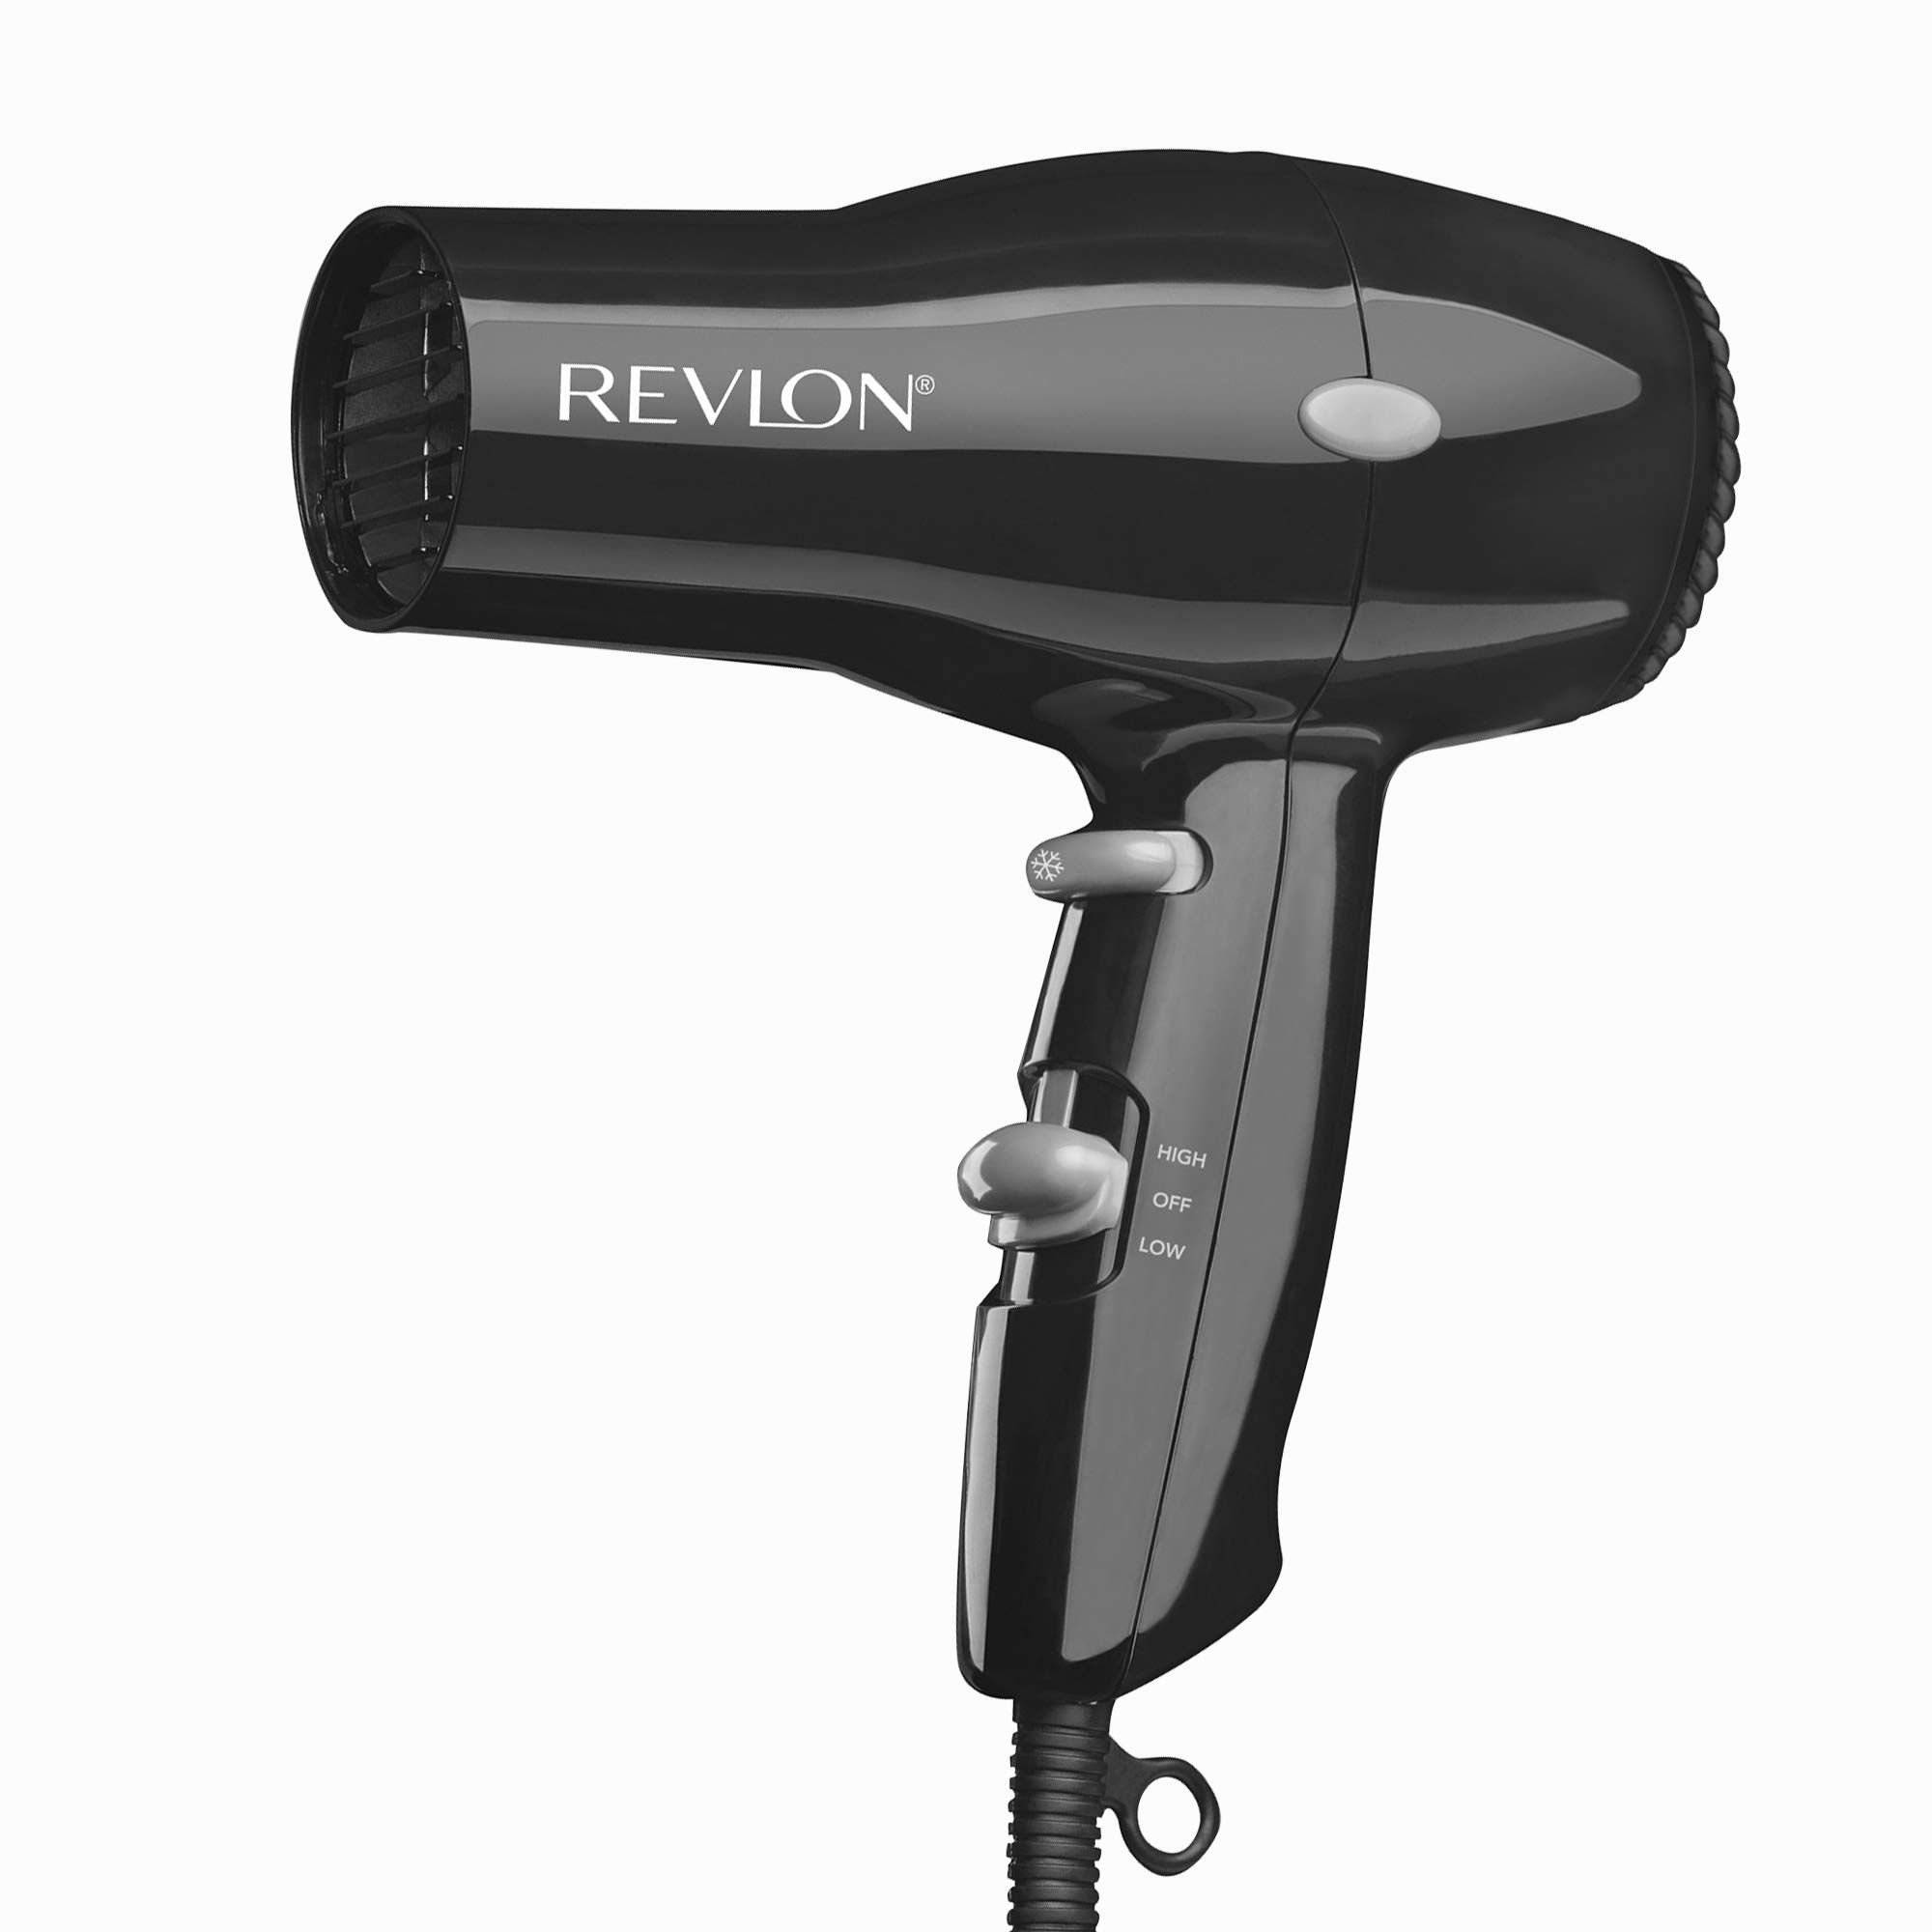 REVLON 1875W Lightweight + Compact Travel Hair Dryer, Black